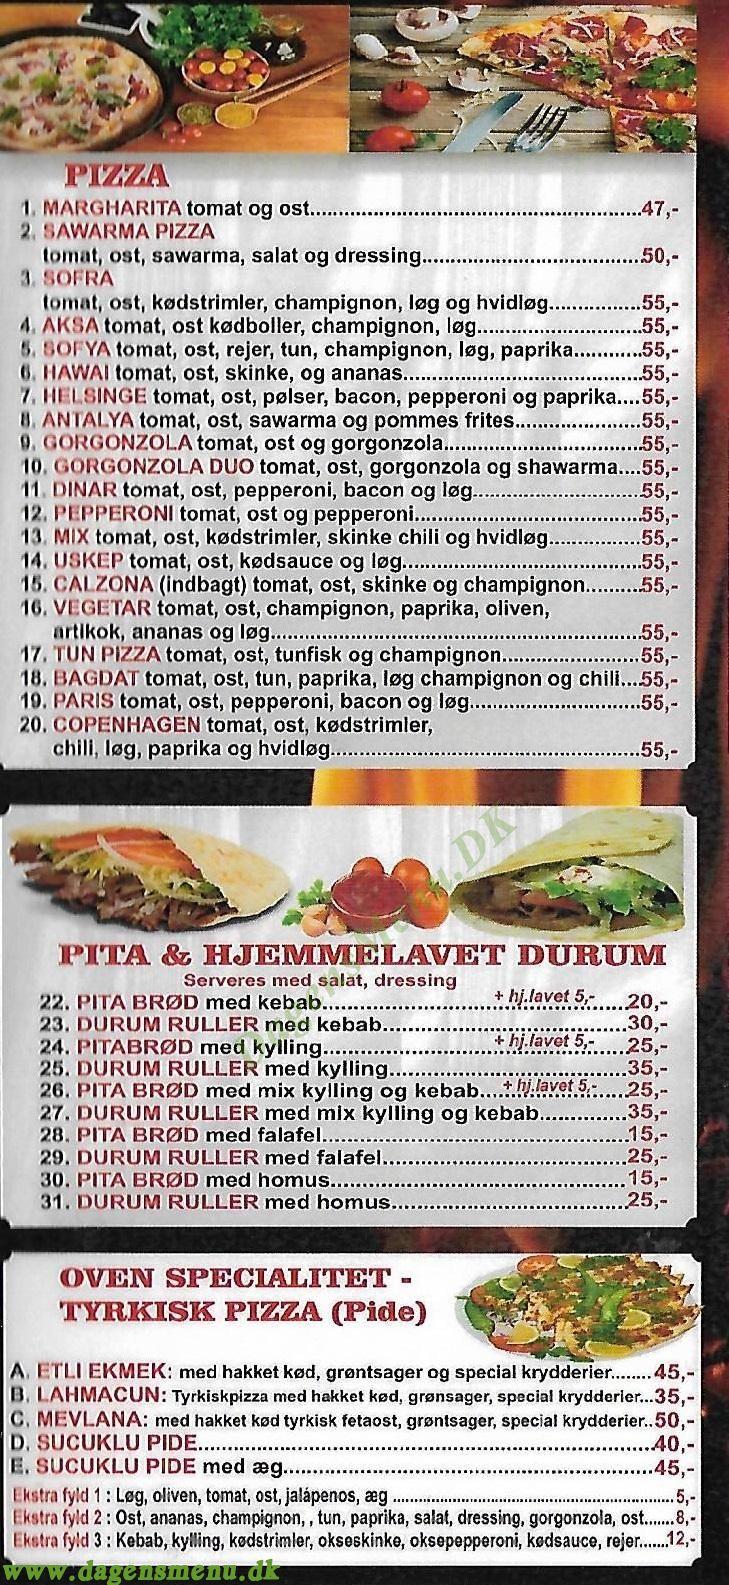 Sofra pizza kebab - Menukort